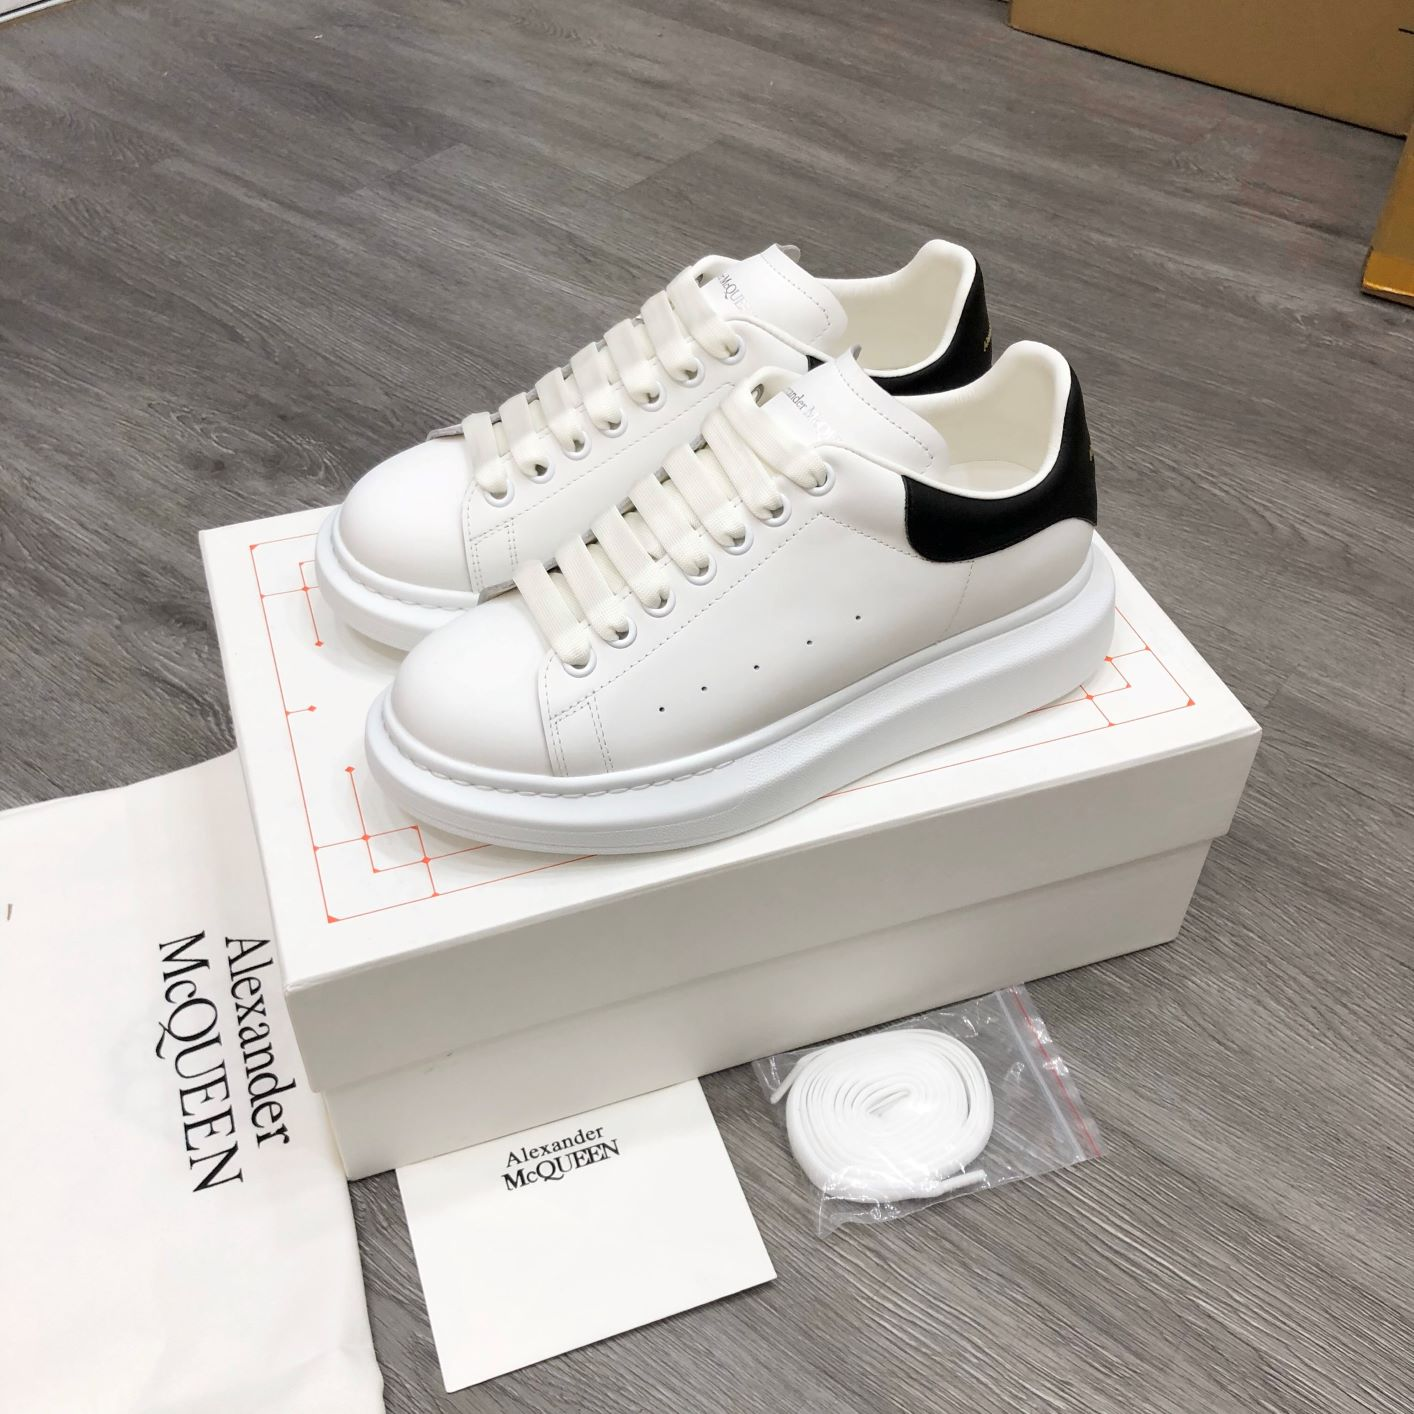 Giày Alexander MCqueen trắng gót đen